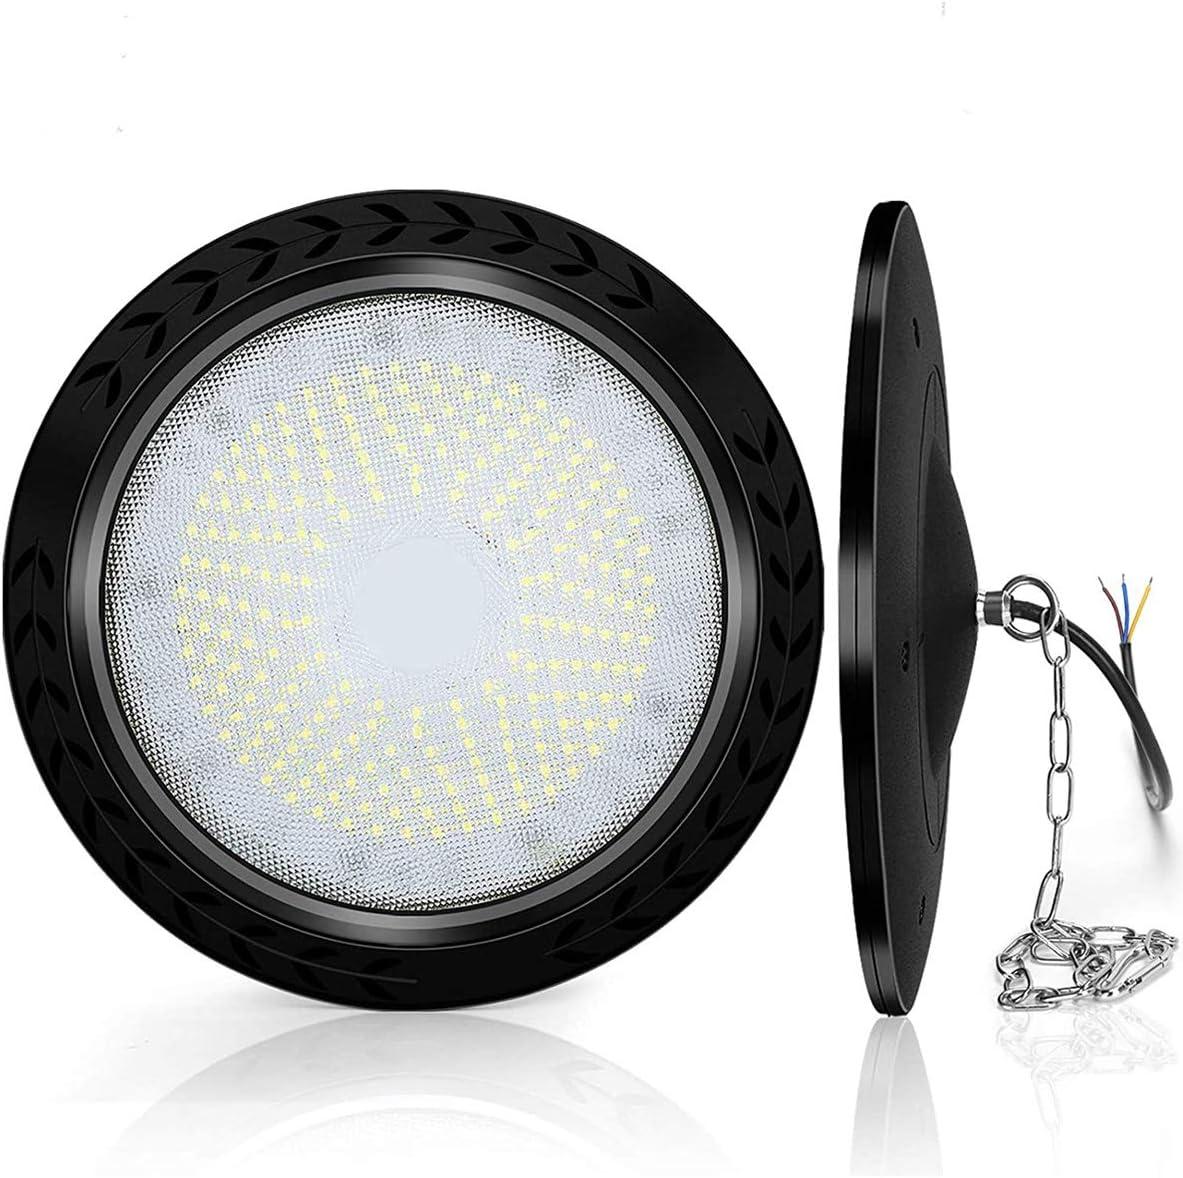 Low price LED 4 years warranty High Bay Light 100W 10000LM Shop Li Led Garage UFO